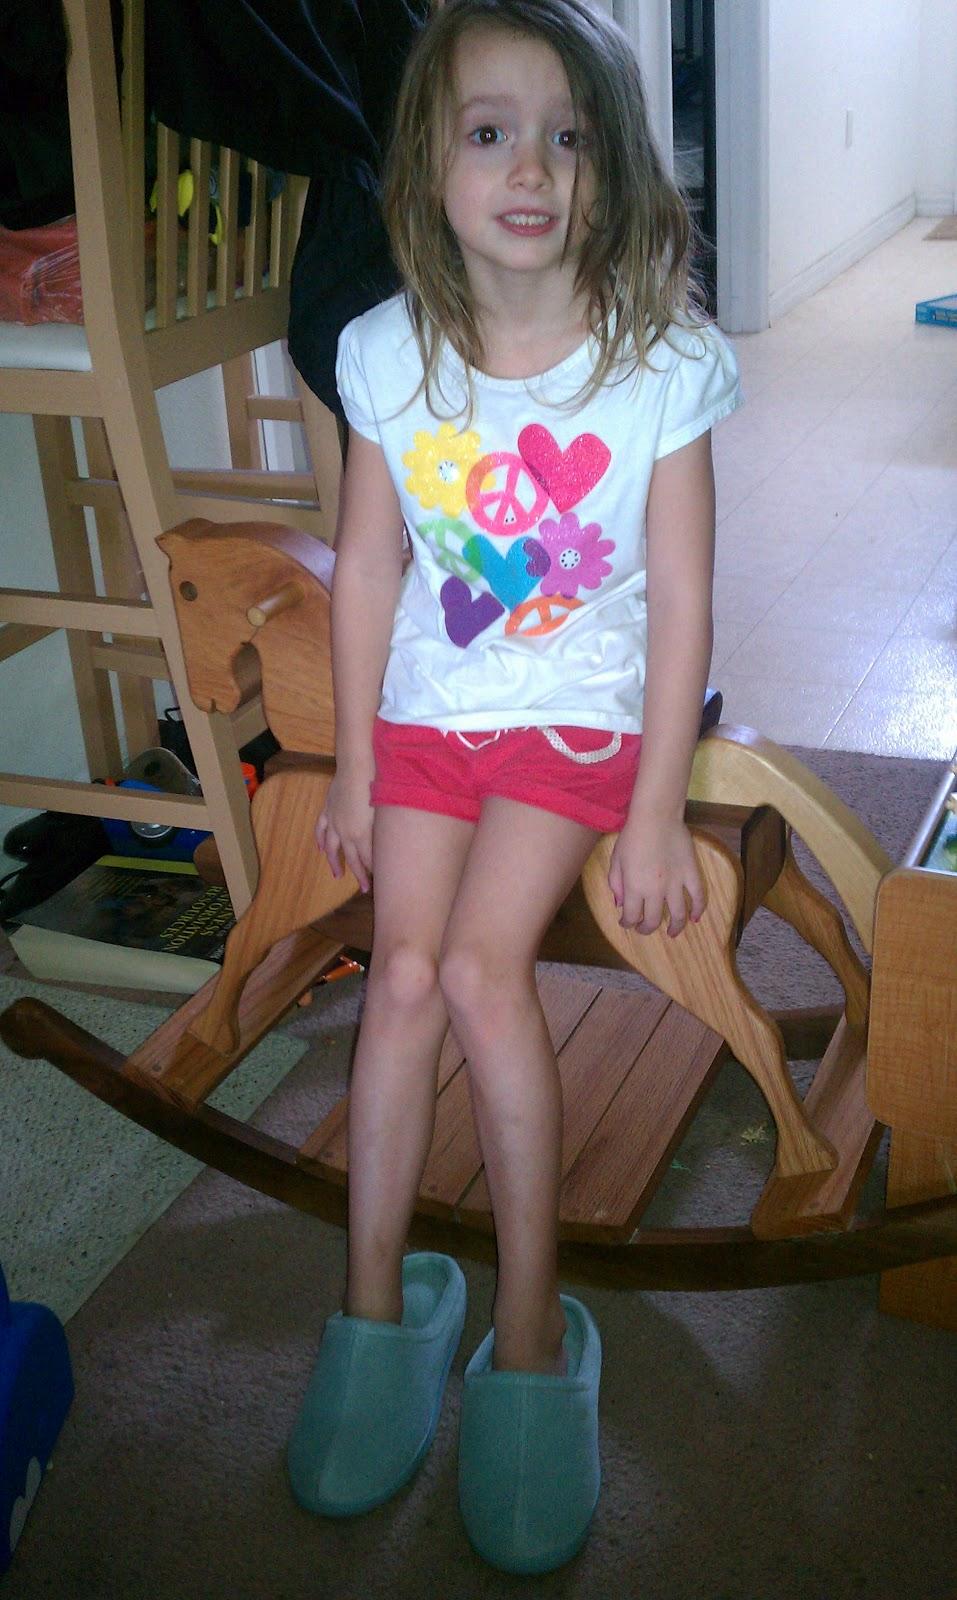 Teenage Girls Wearing Goodnites